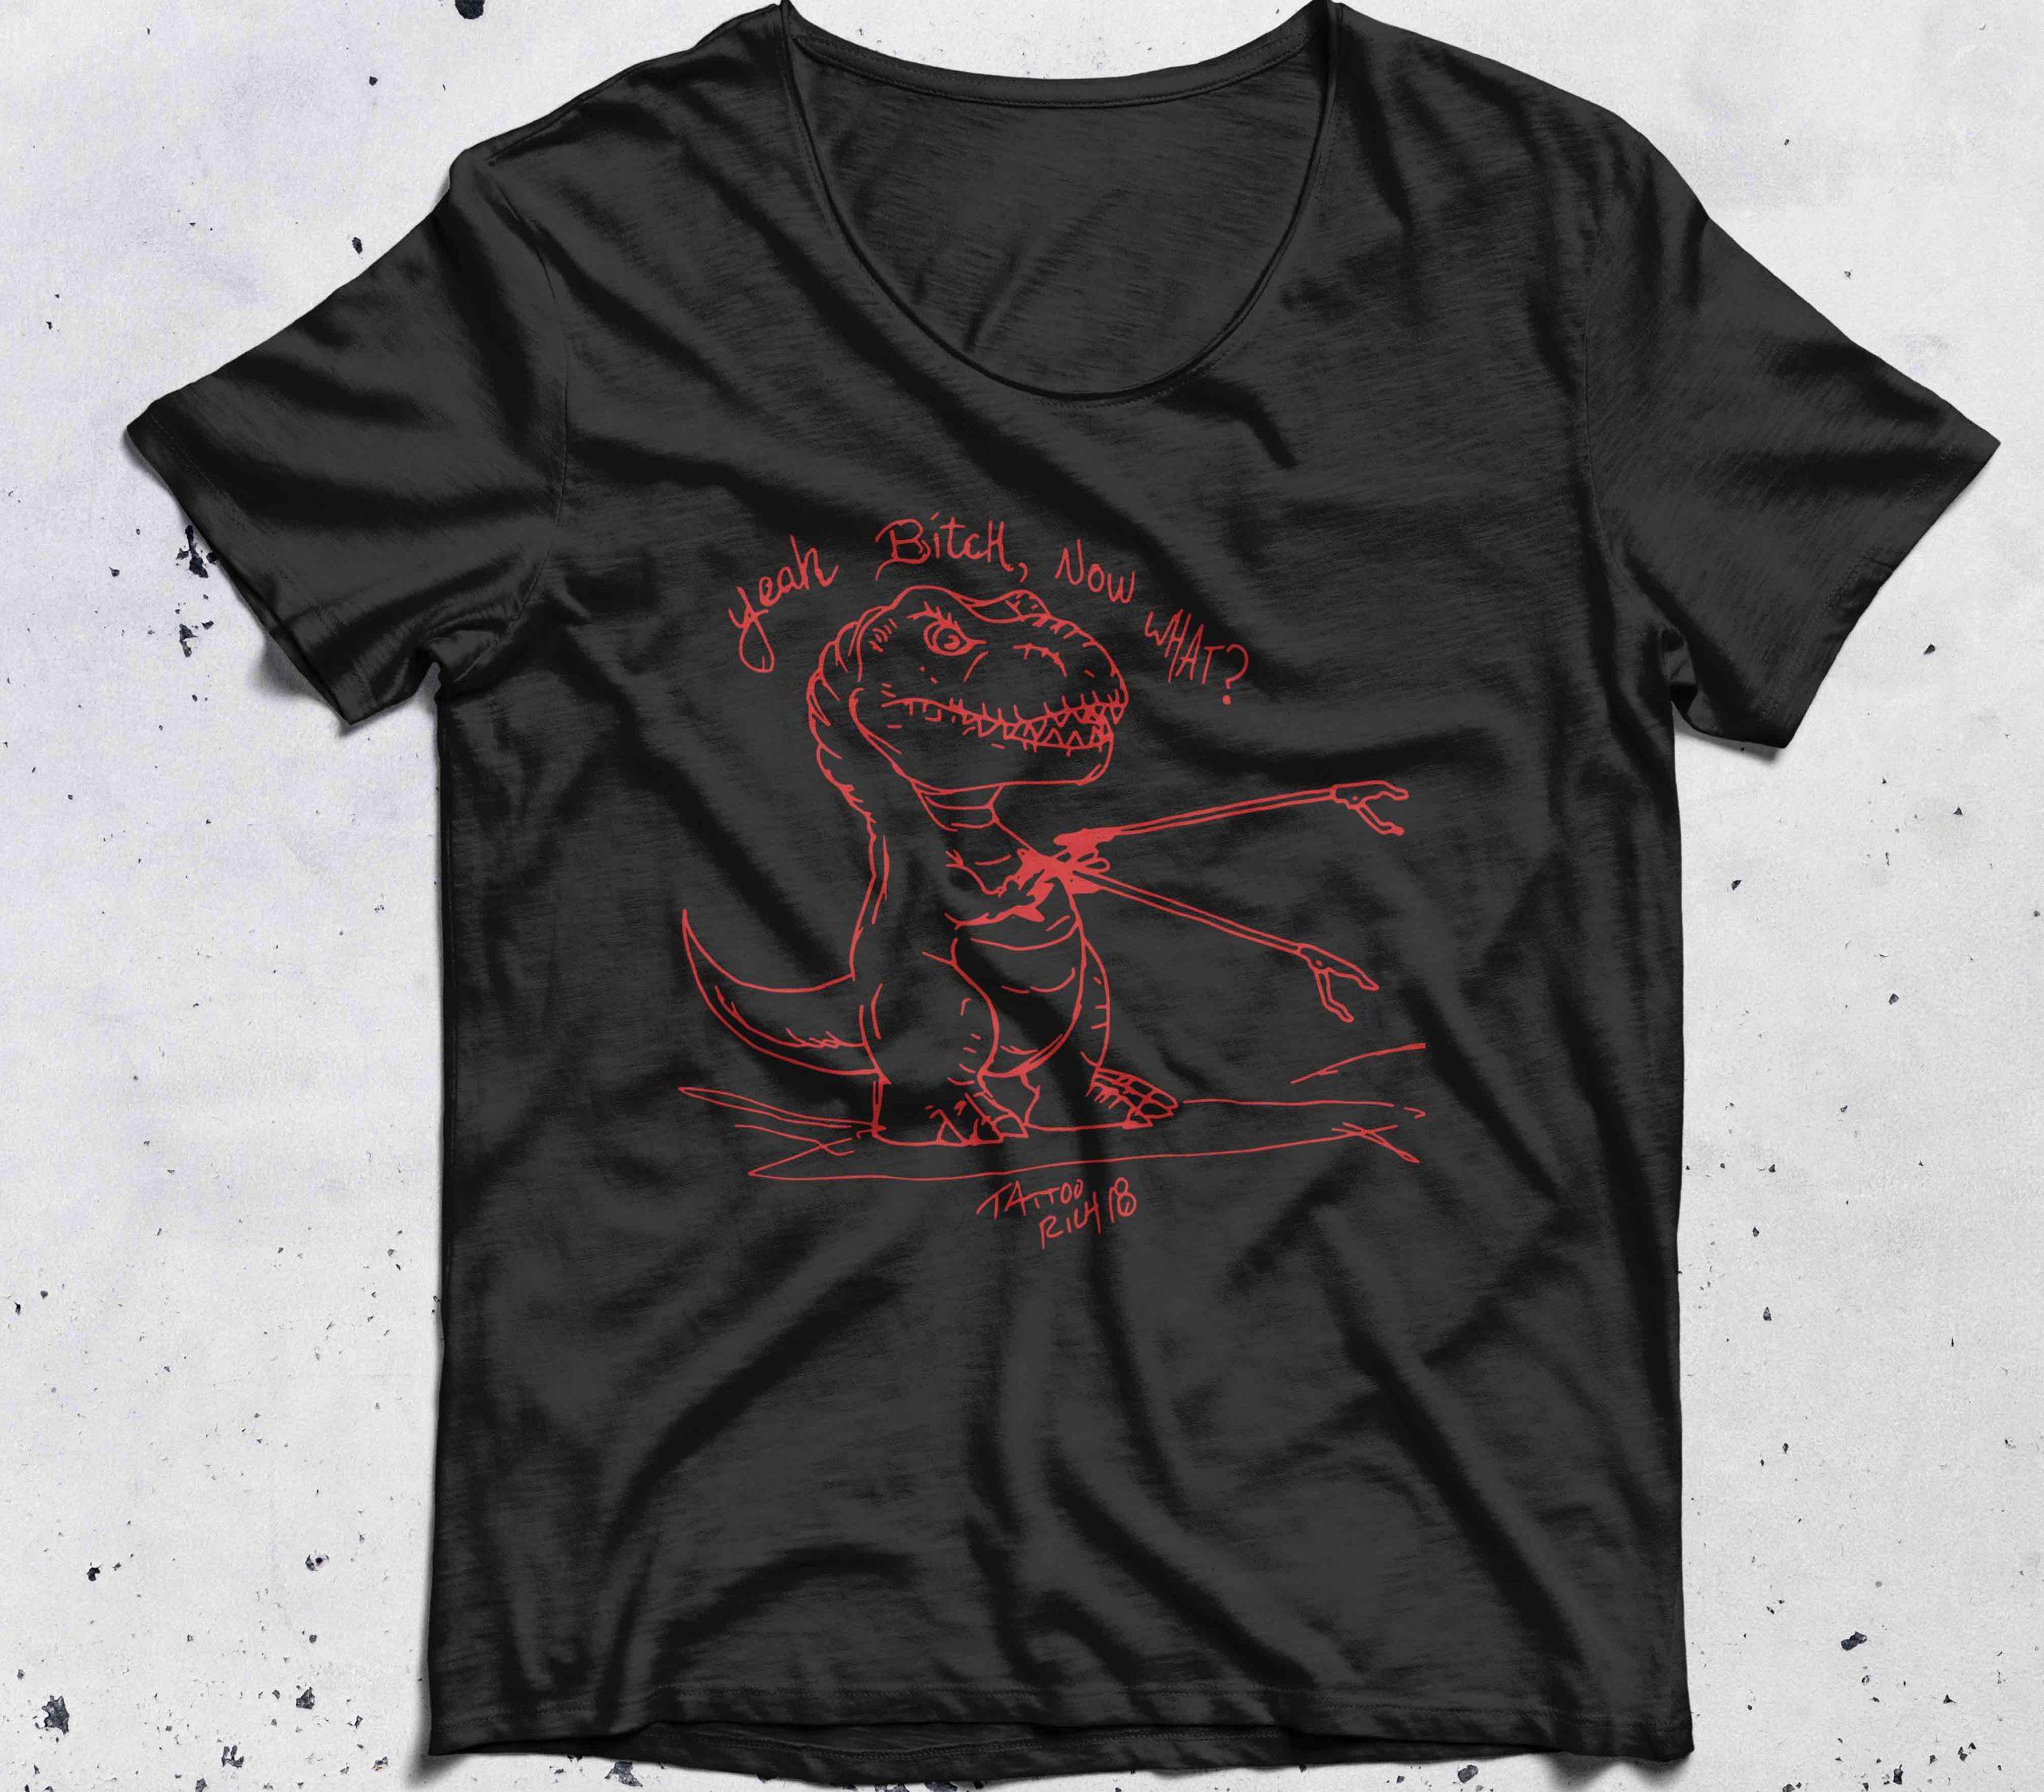 T-rex saurus yeah bitch now what tattoo shirt